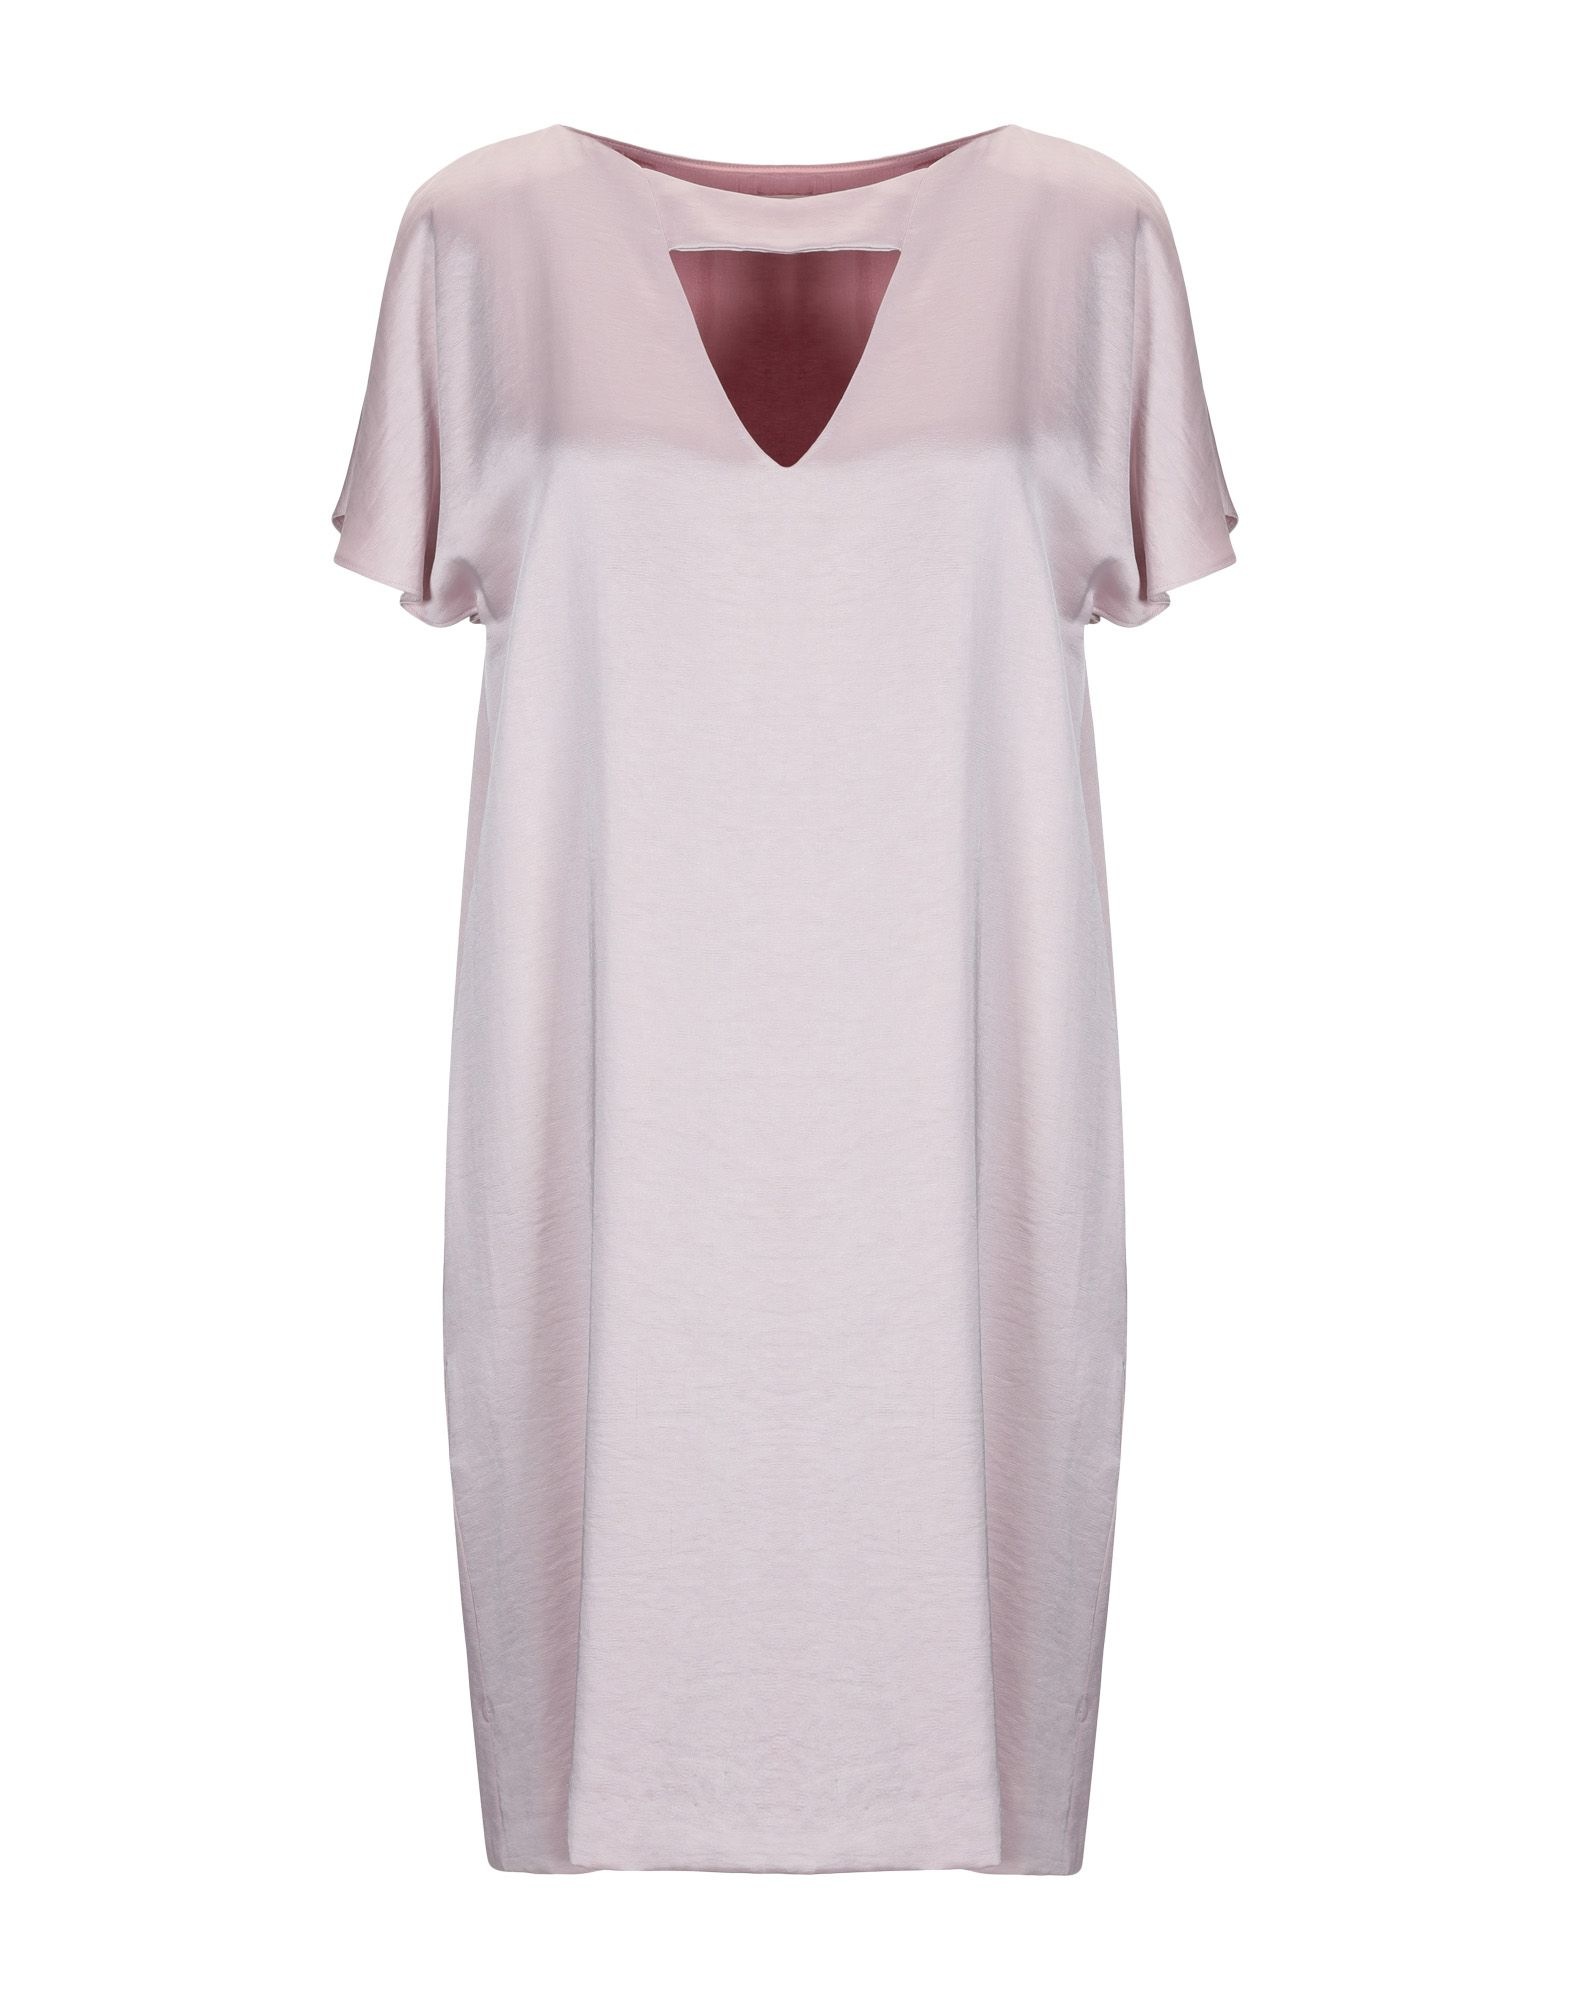 ALEX VIDAL Короткое платье платье alex lu alex lu mp002xw1f8wv